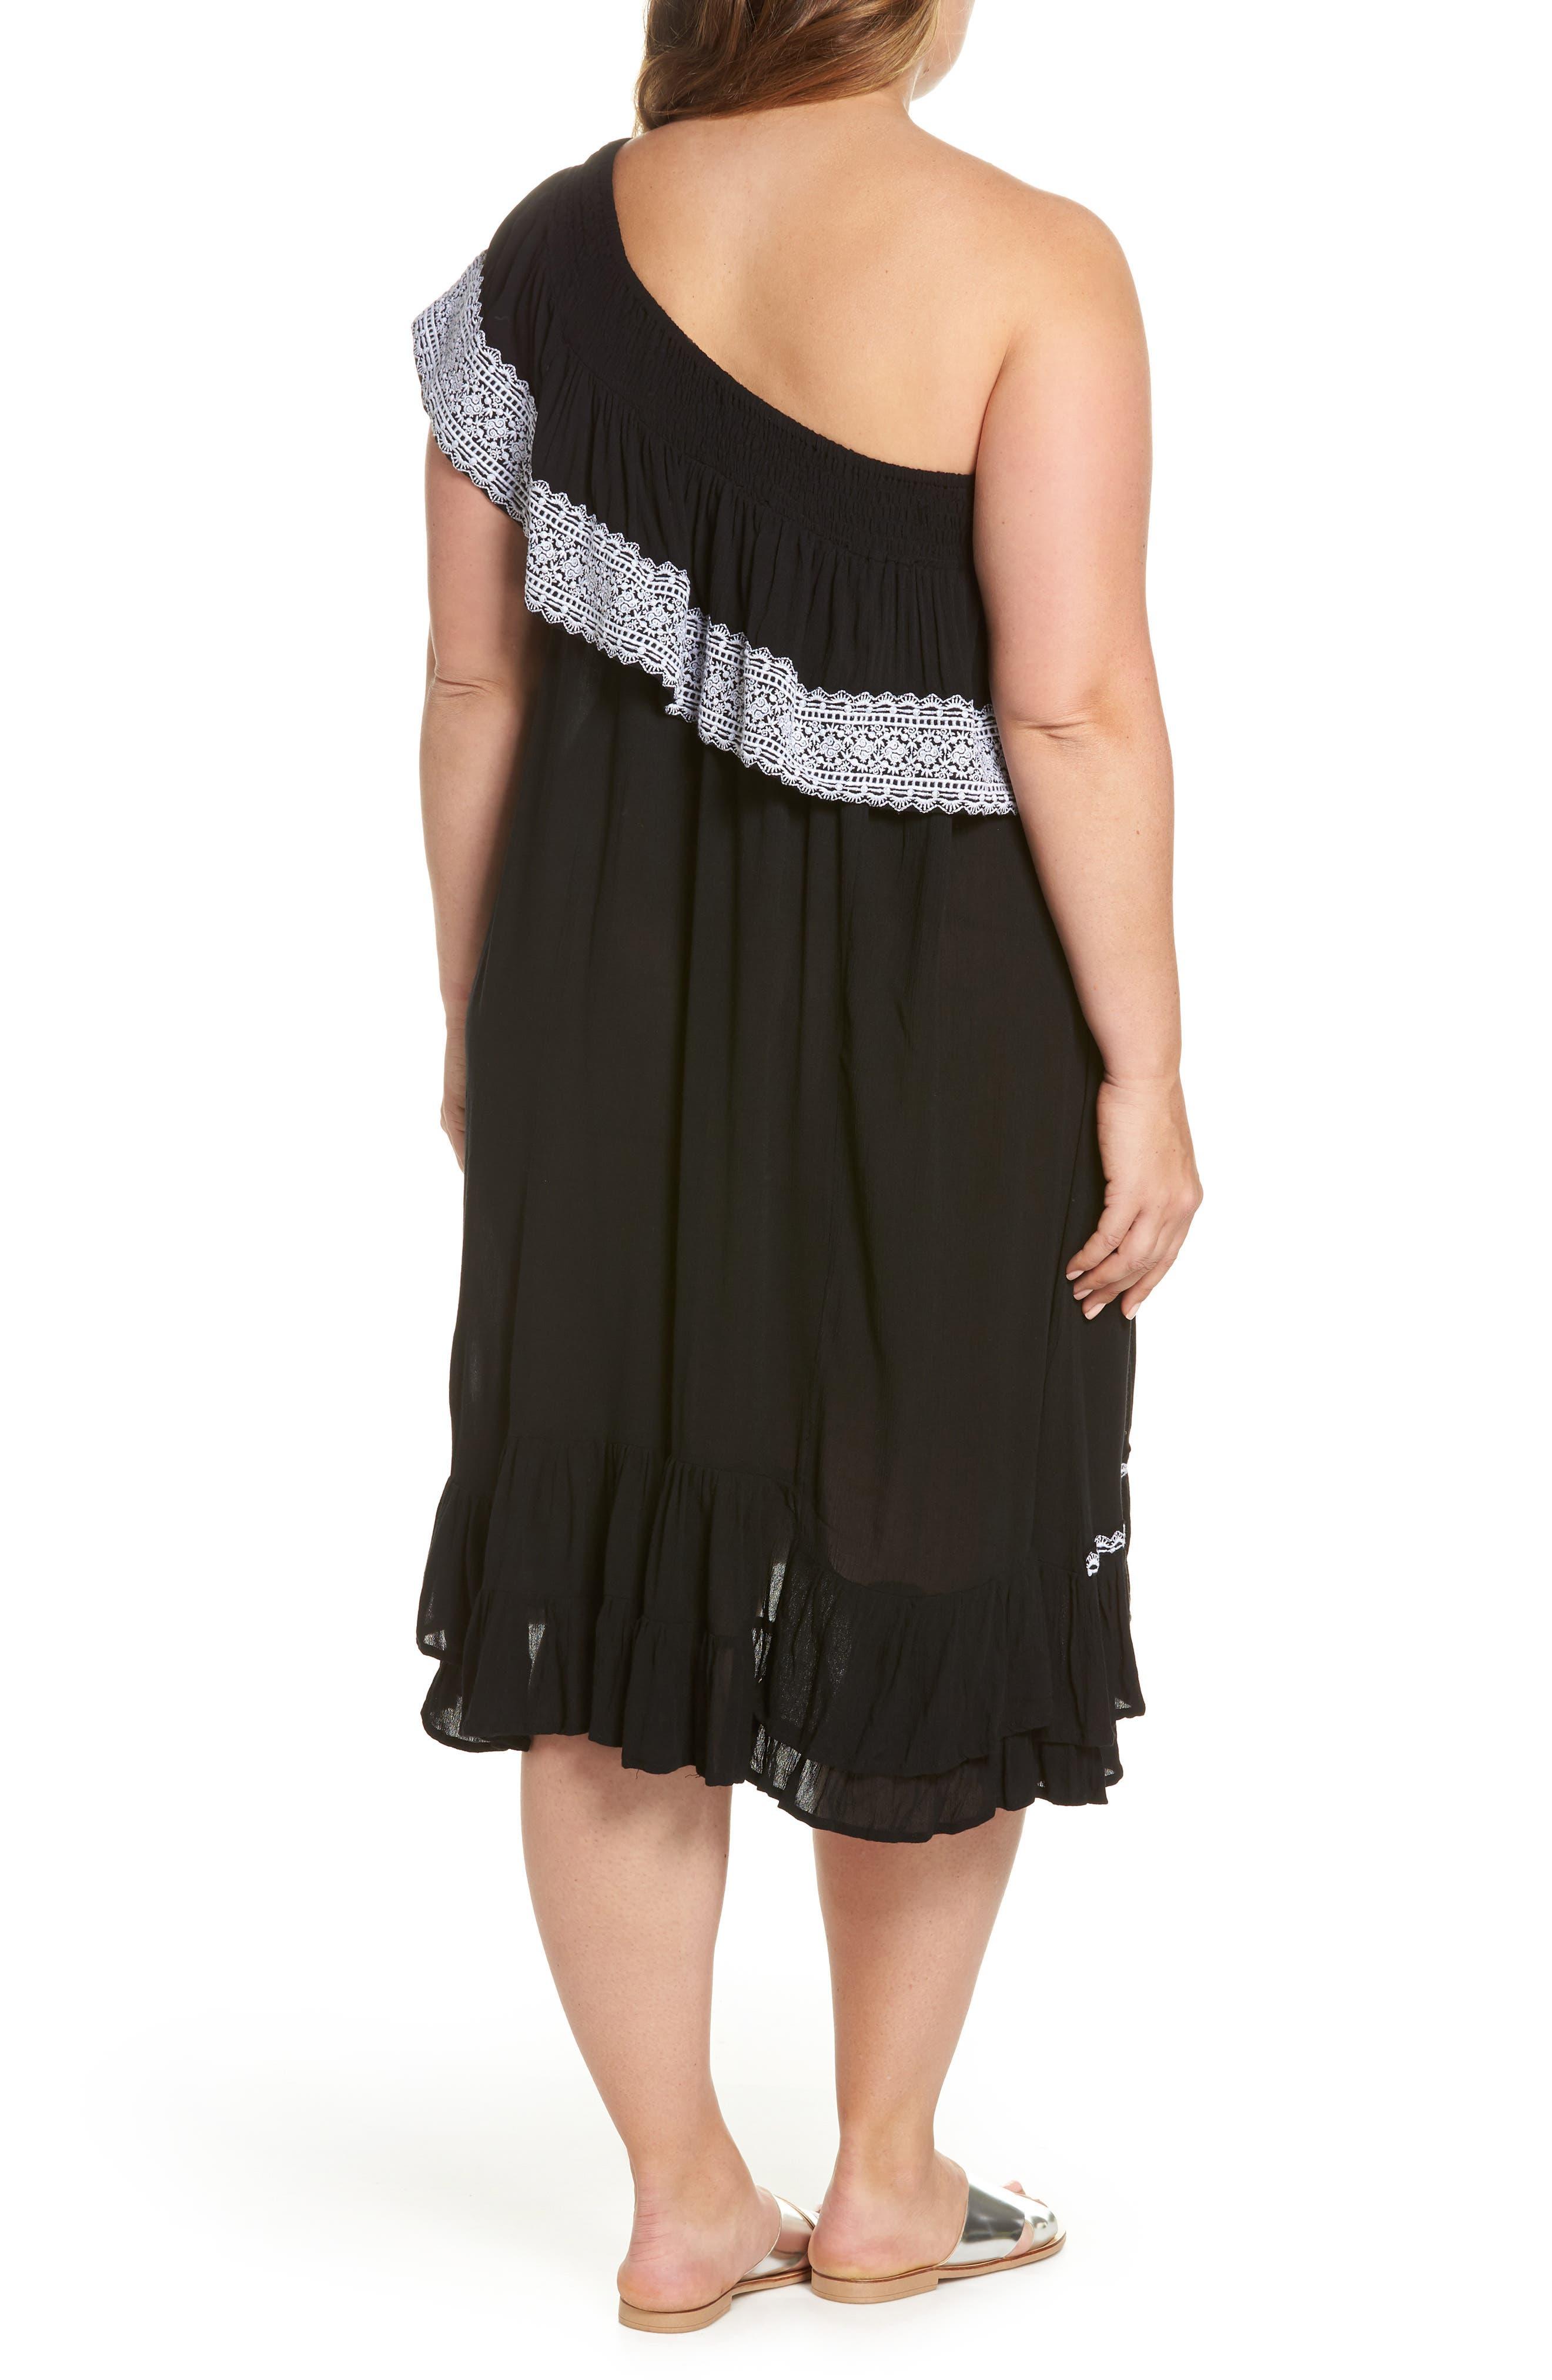 Gavin One-Shoulder Cover-Up Dress,                             Alternate thumbnail 2, color,                             002